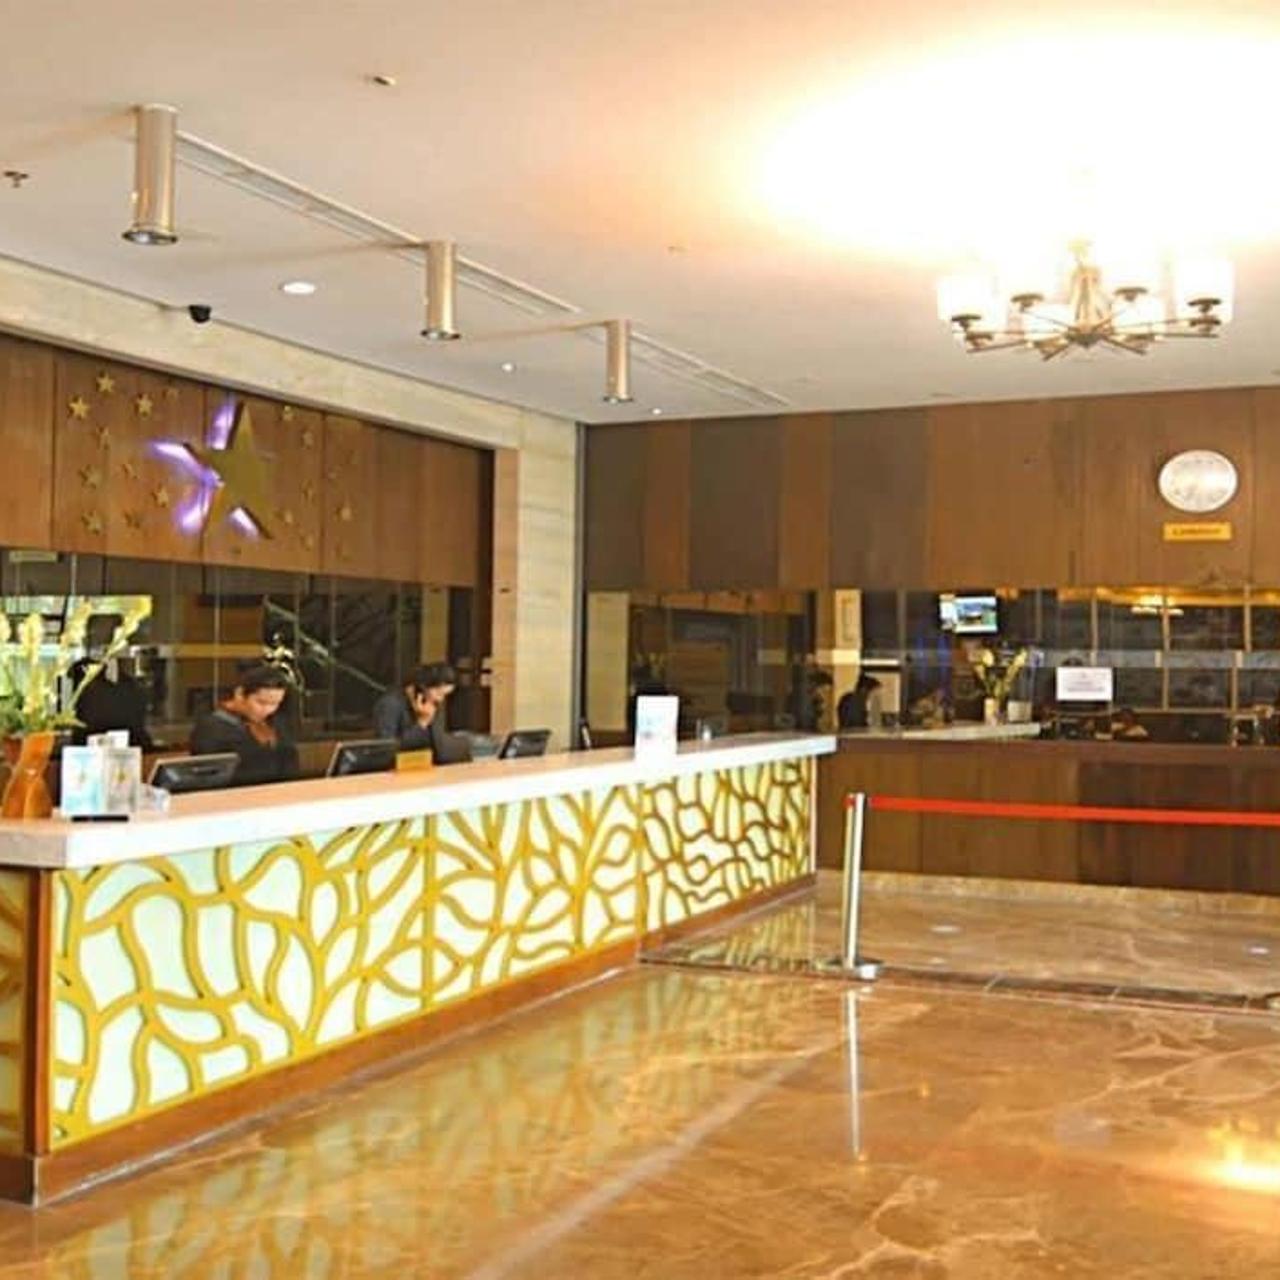 Star Hotel Semarang 4 Hrs Star Hotel In Semarang